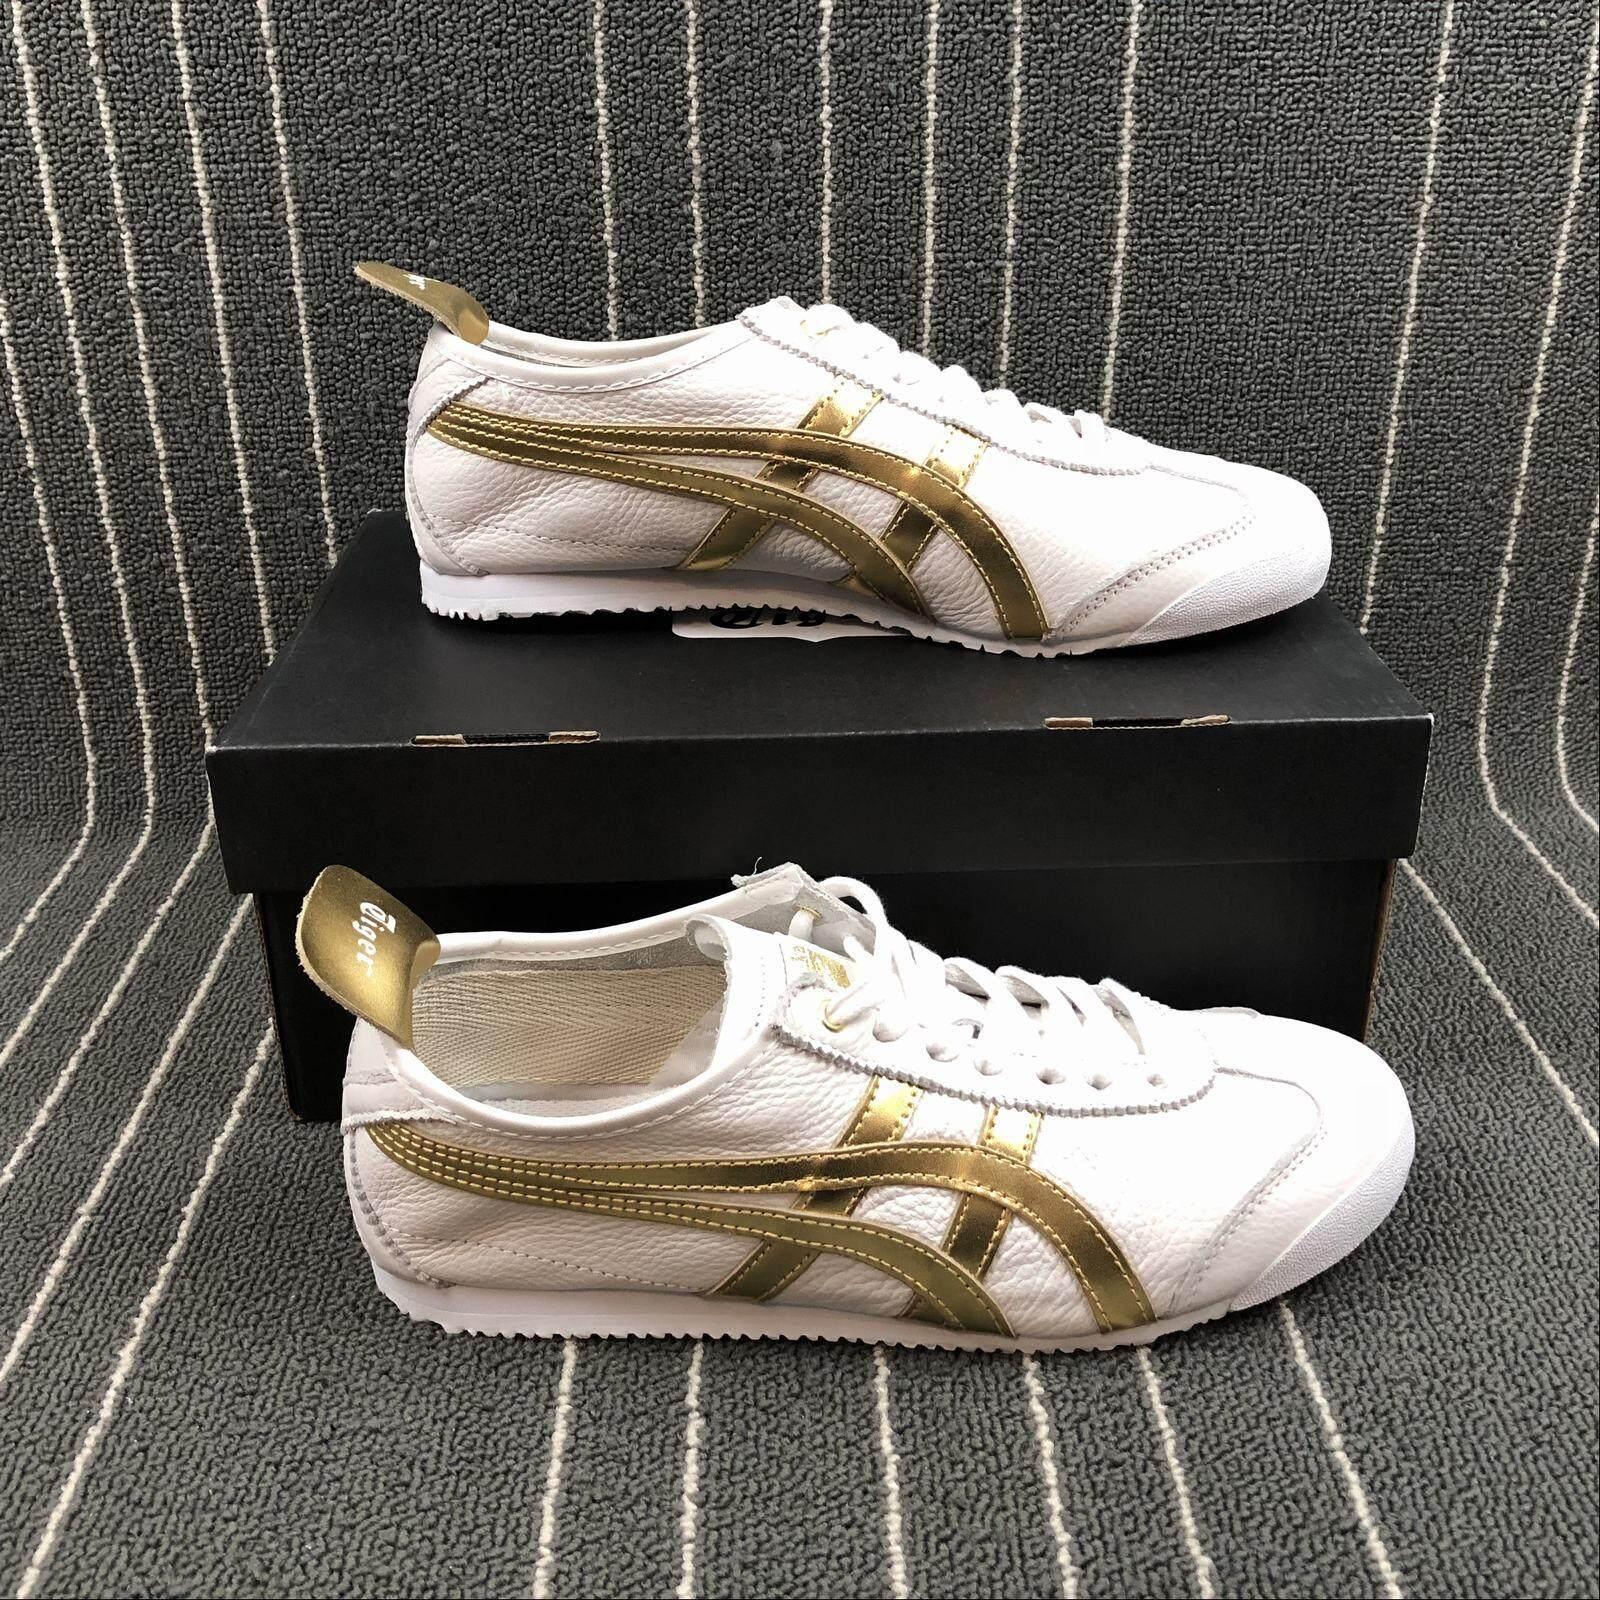 more photos e89e0 b8c3d 2019 Fashion Discount Asics Onitsuka tiger MEXICO 66 D508K-0194  Men's/Women's Sport Fashion Running Shoes